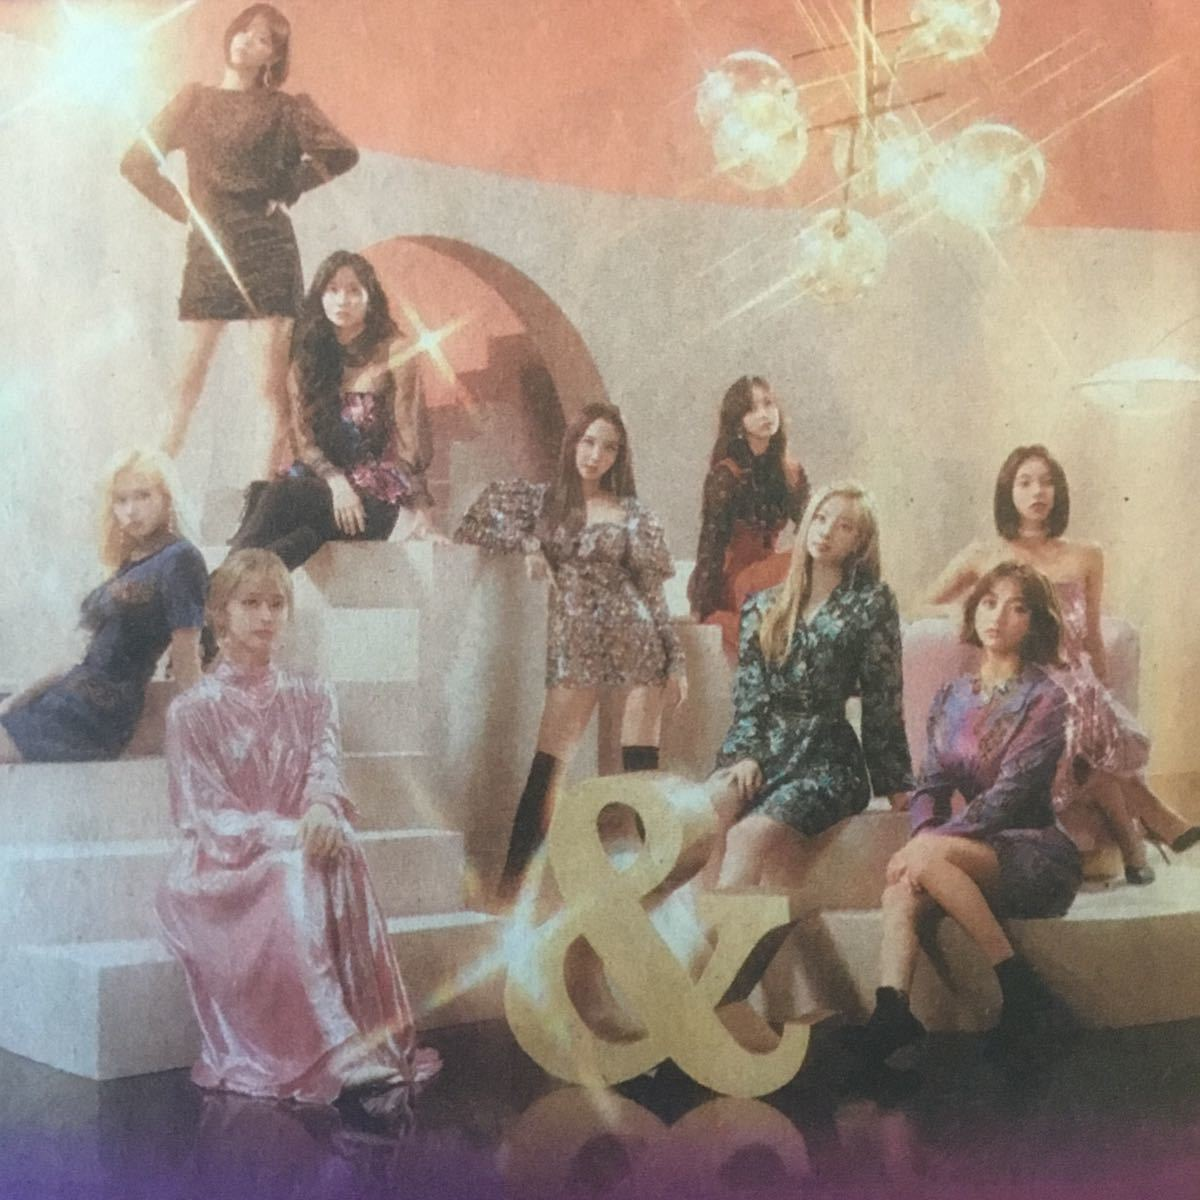 値下↓TWICE WORLD TOUR 2019 東京ドーム追加公演決定 朝日新聞記事紙面191130_画像1